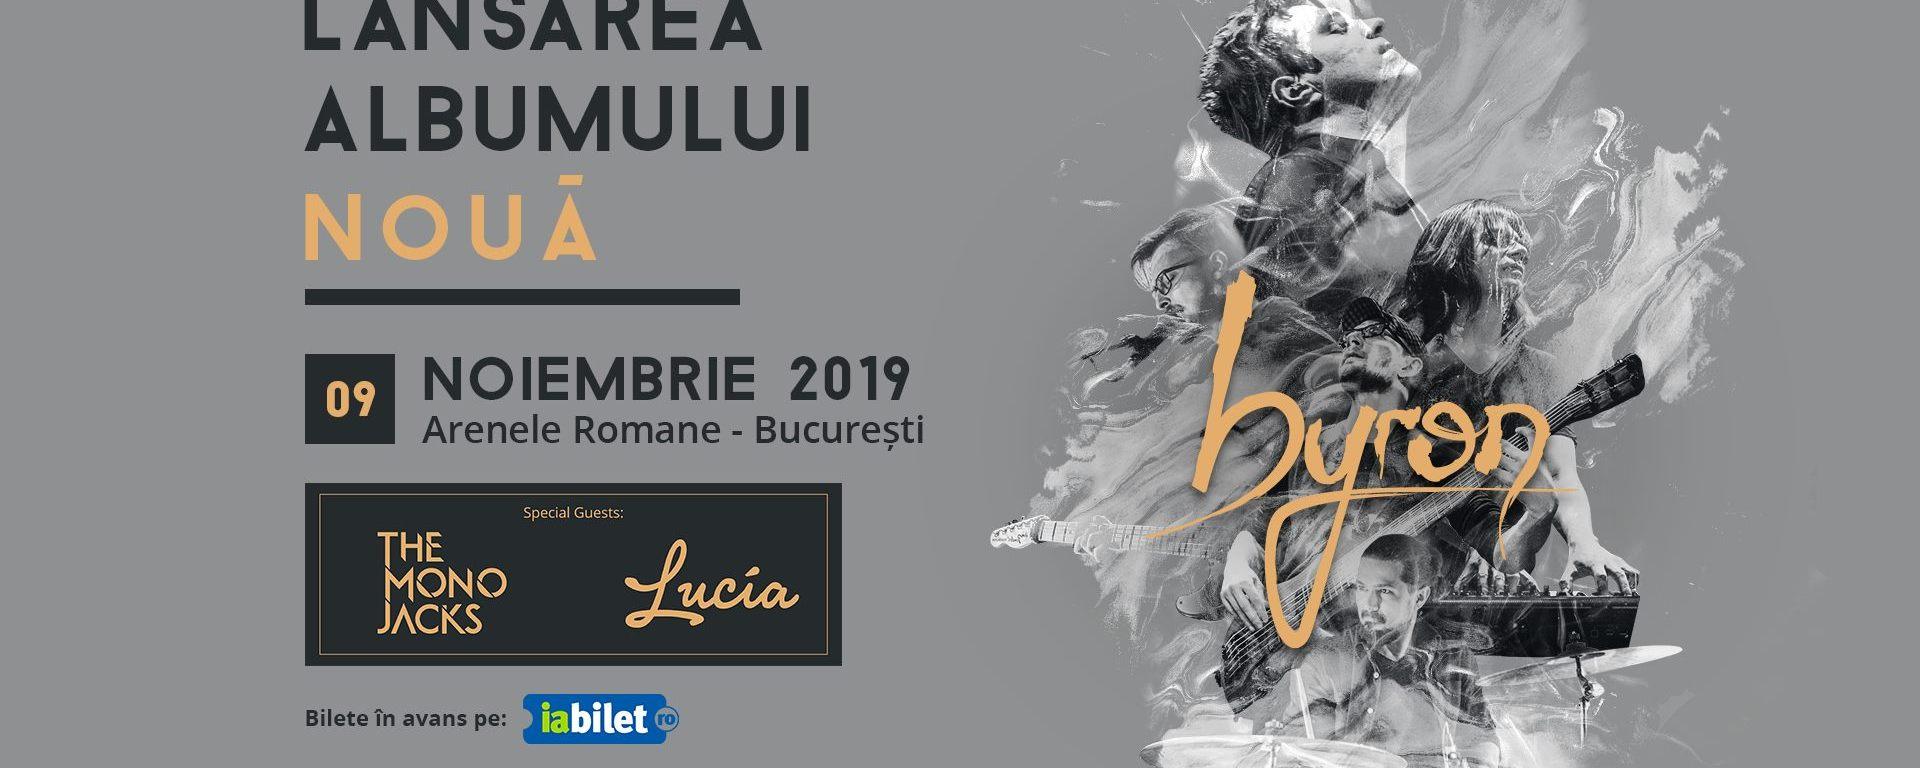 byron - lansare album la Arene; invitați - Lucia, The Mono Jacks